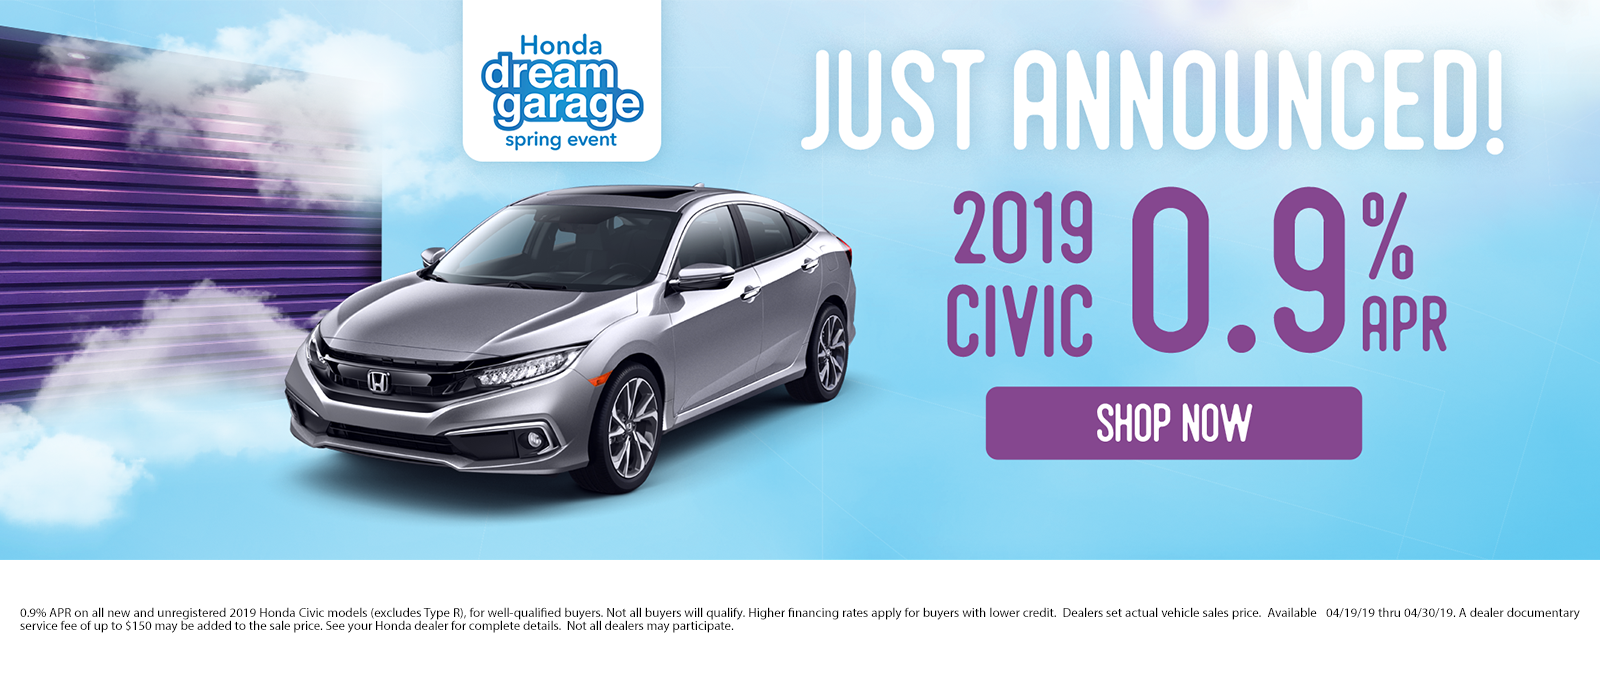 2019 Civic 0.9% APR